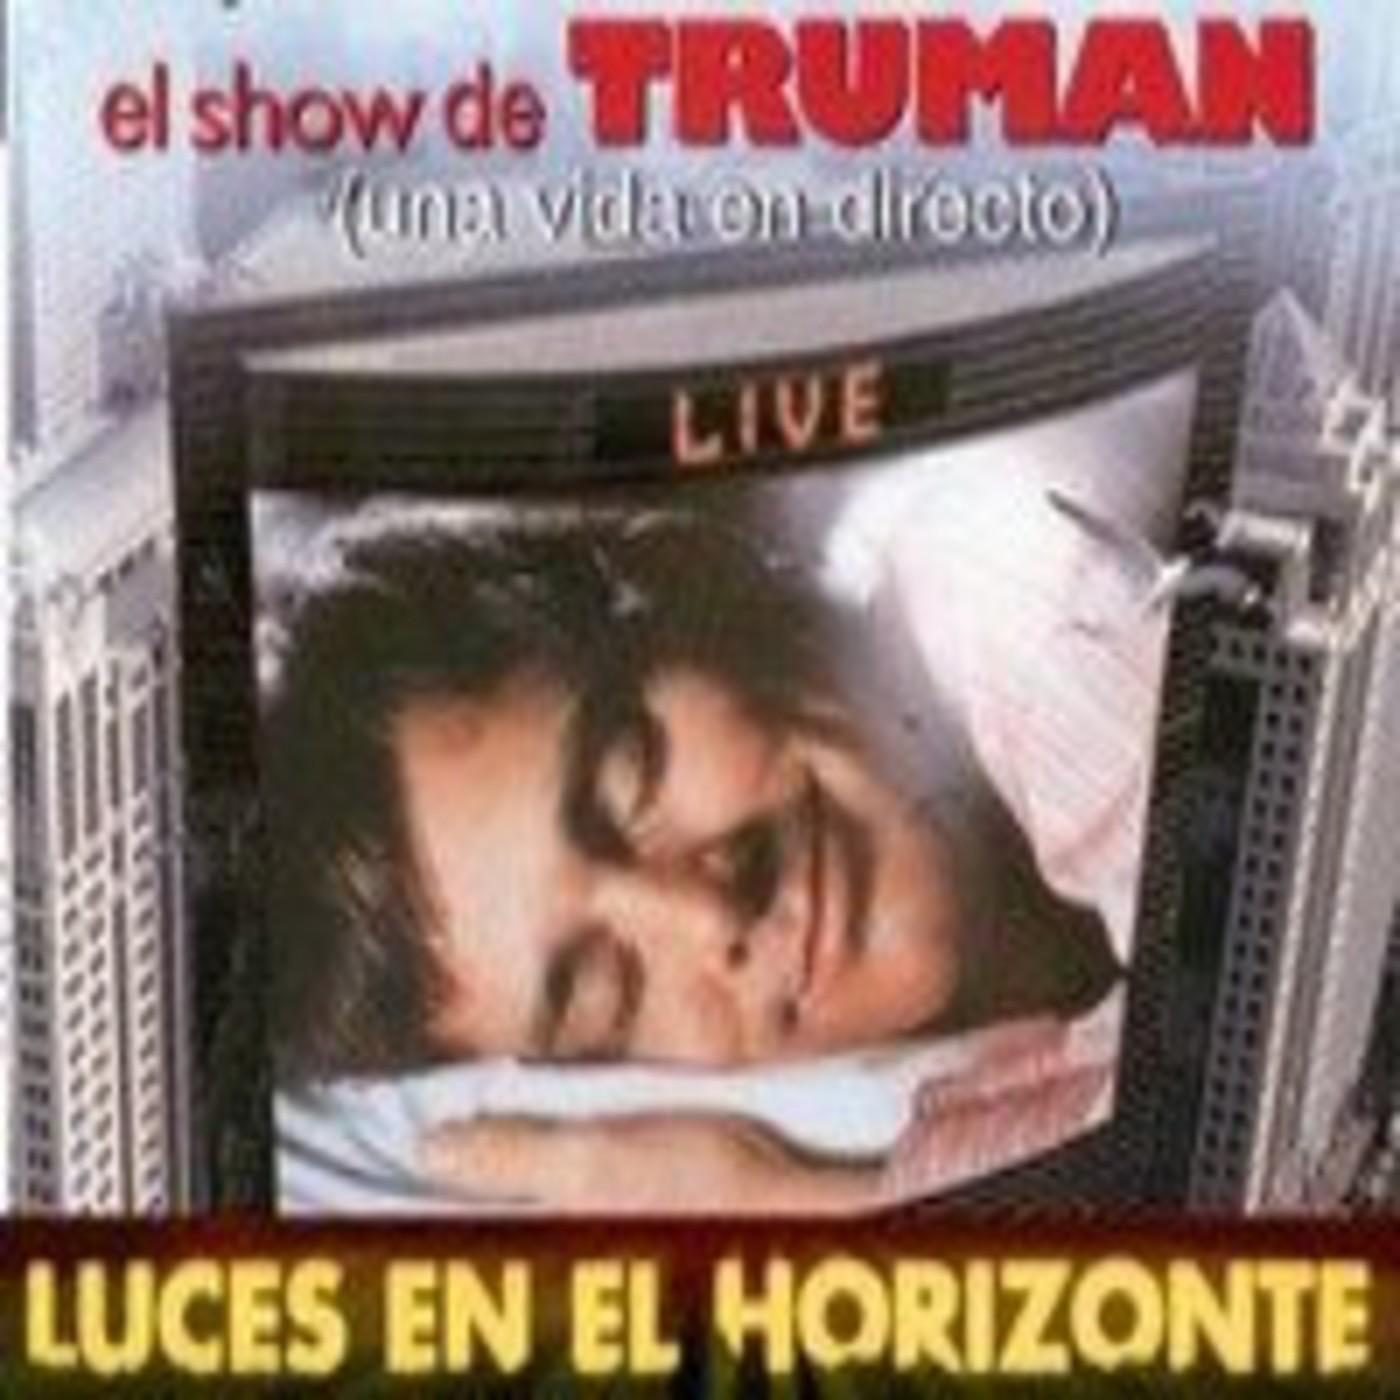 El show de Truman - Luces en el Horizonte